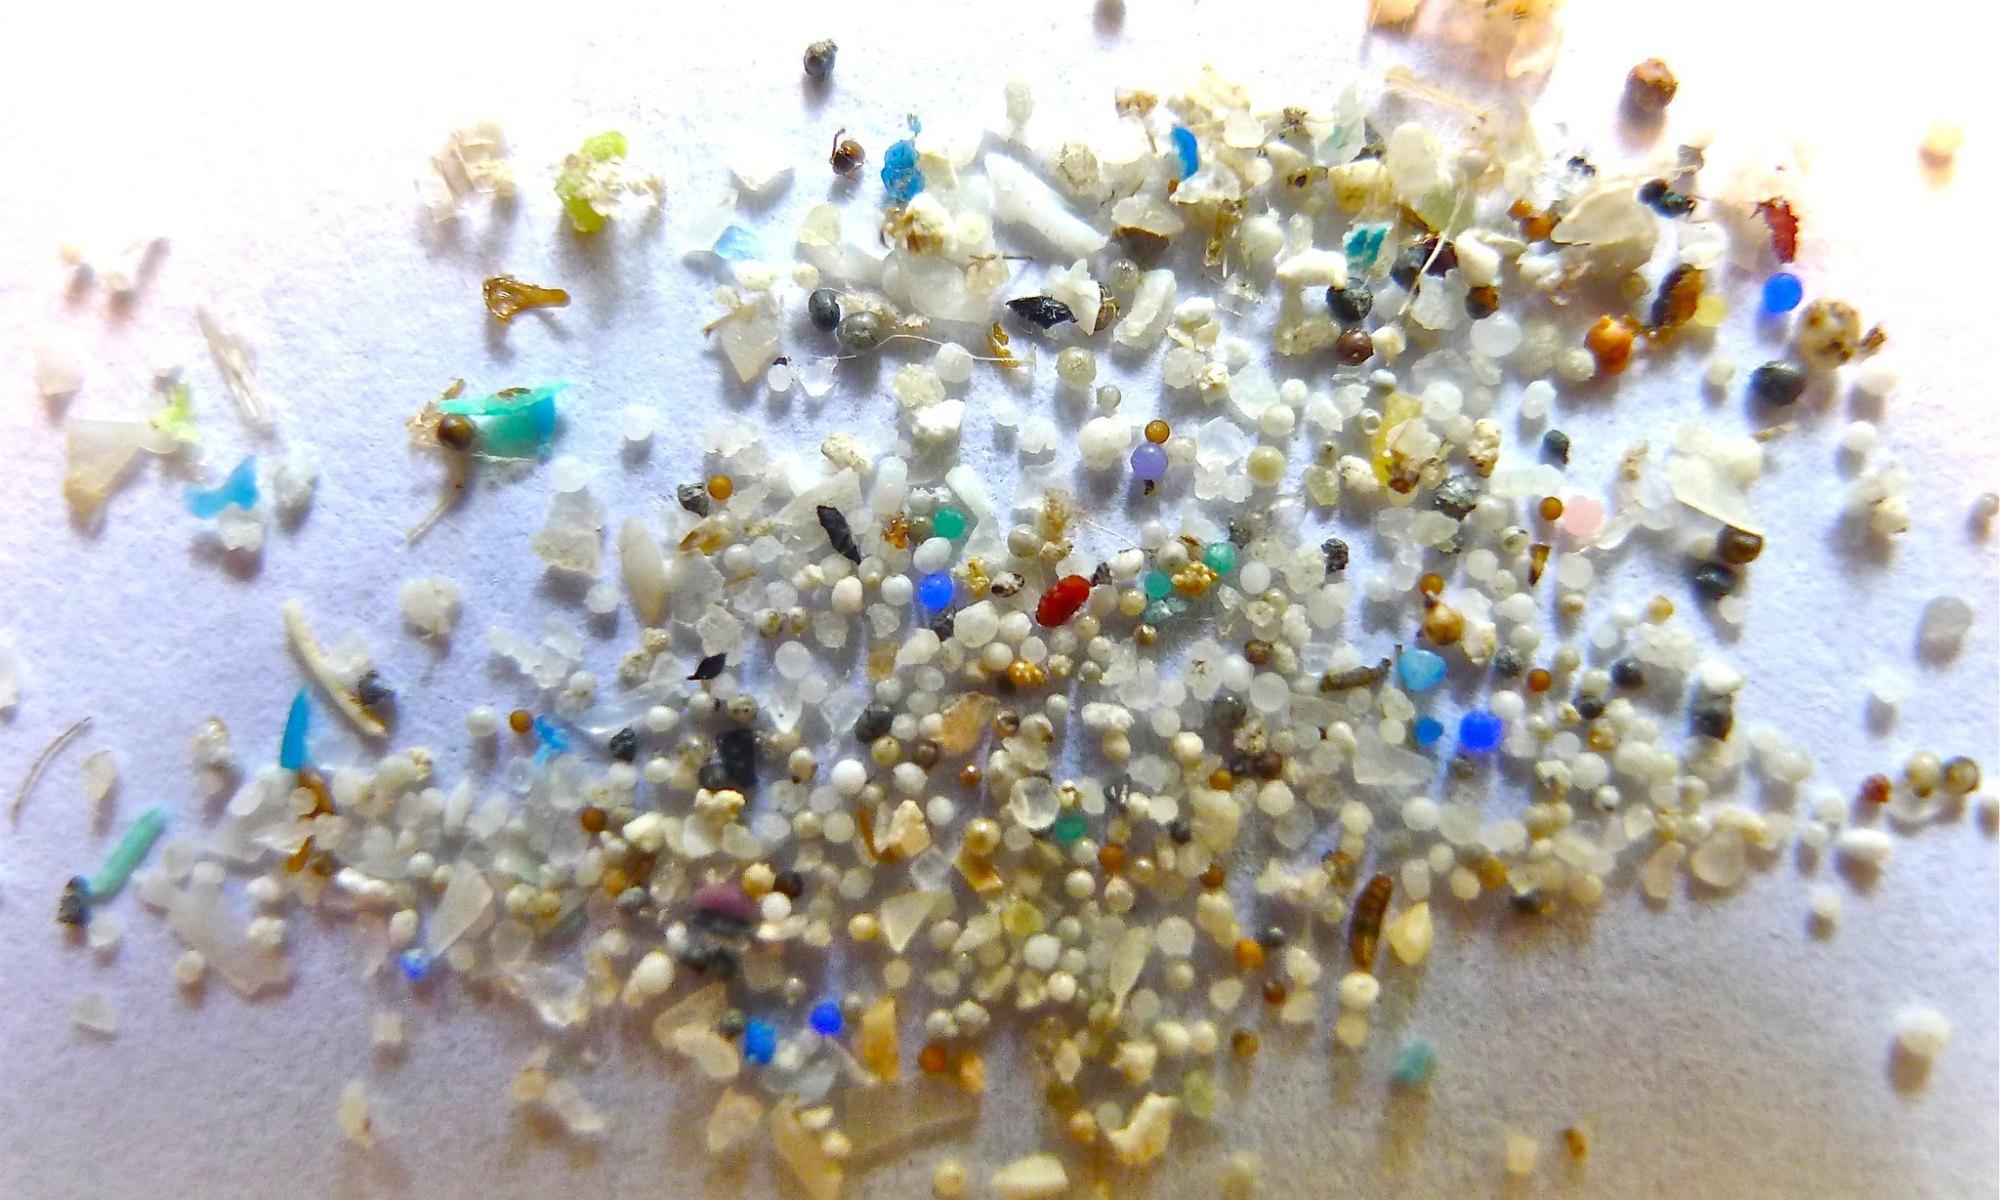 microplastics impact health